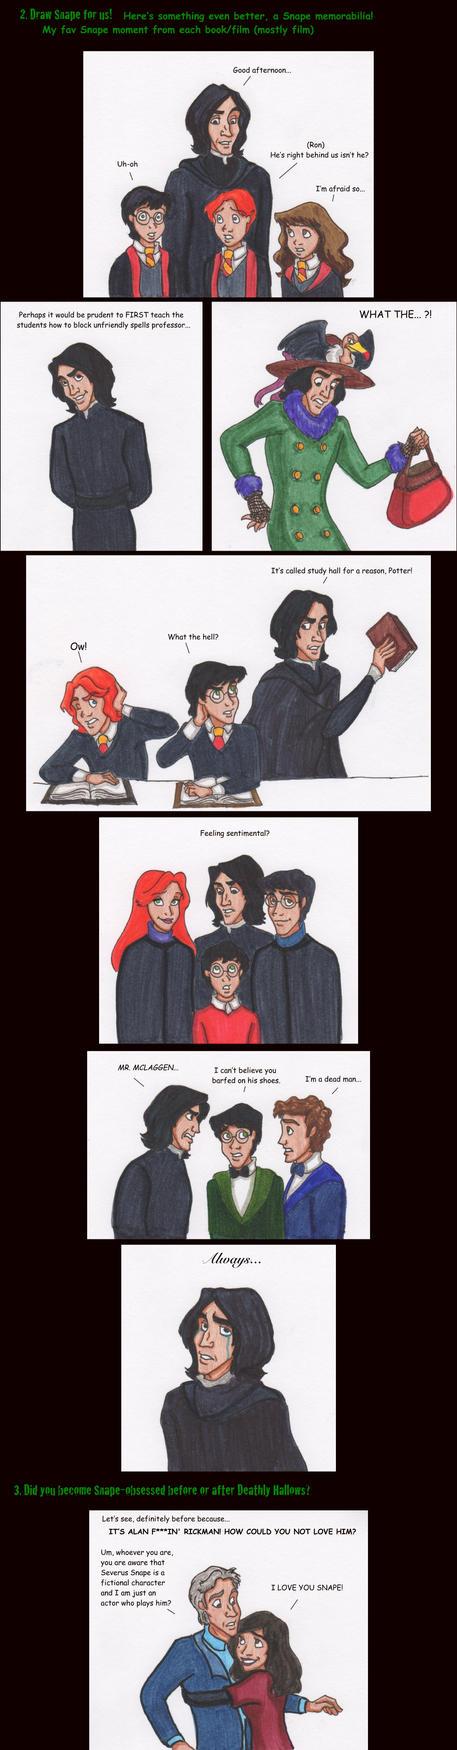 Snape meme part 2 by DKCissner